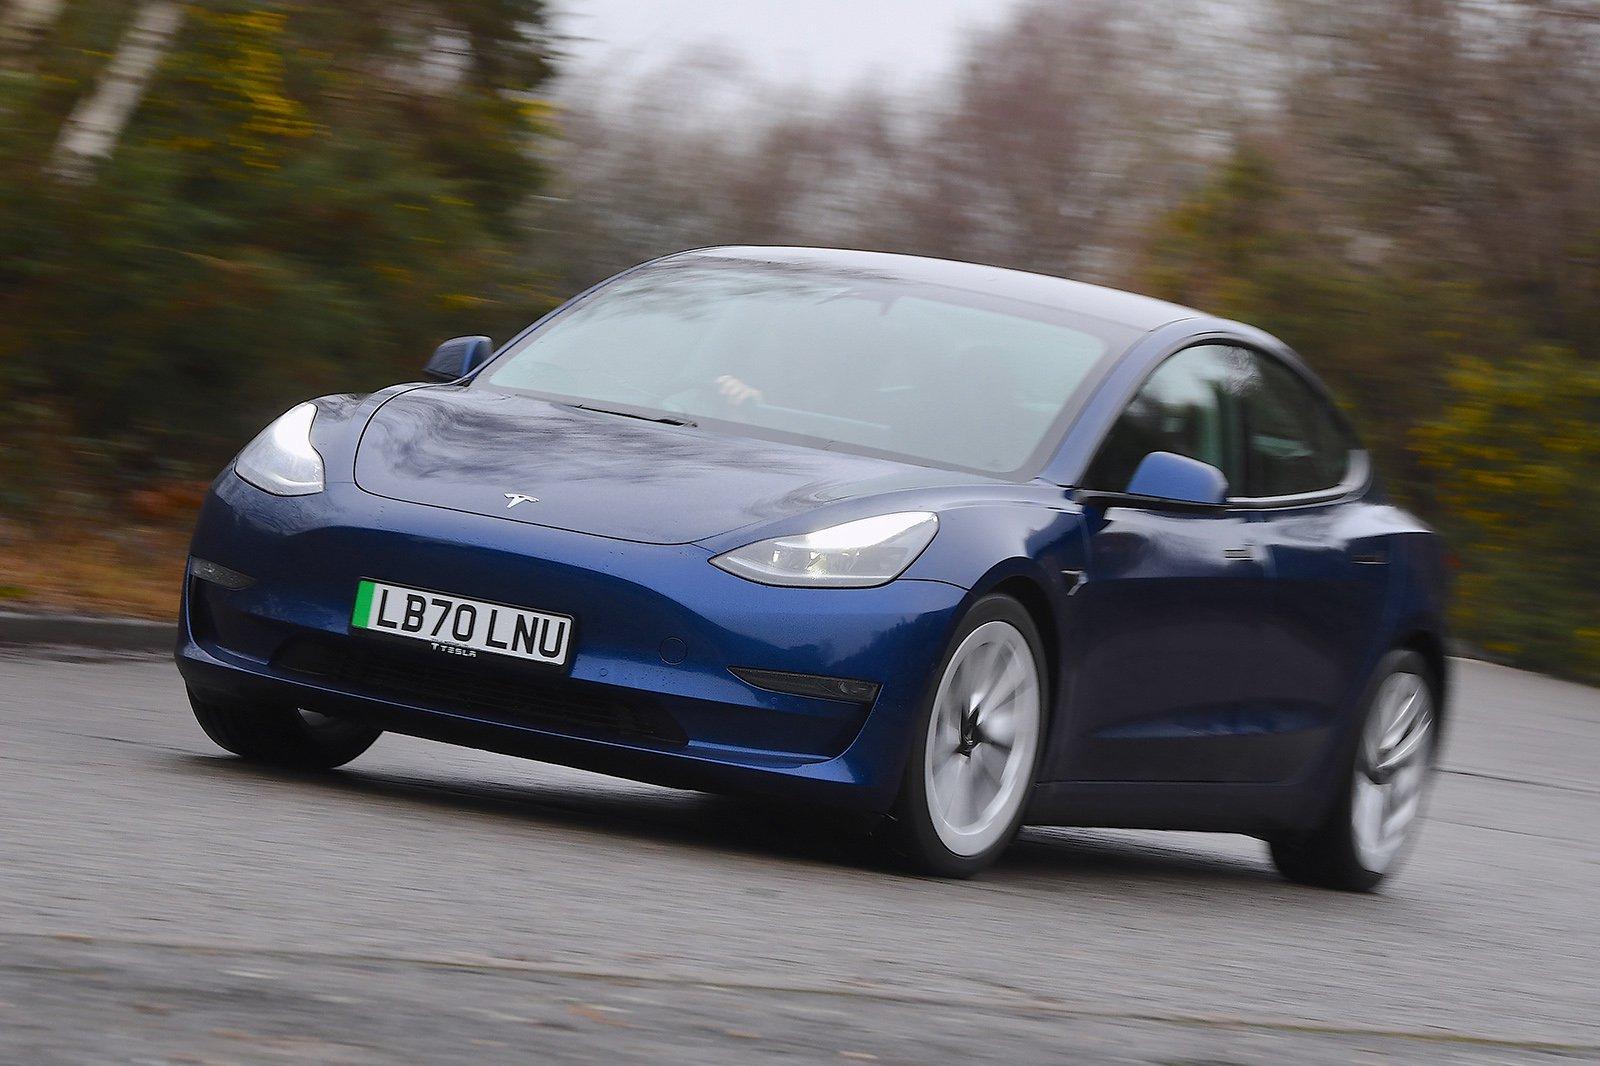 2021 Tesla Model 3 LR hero